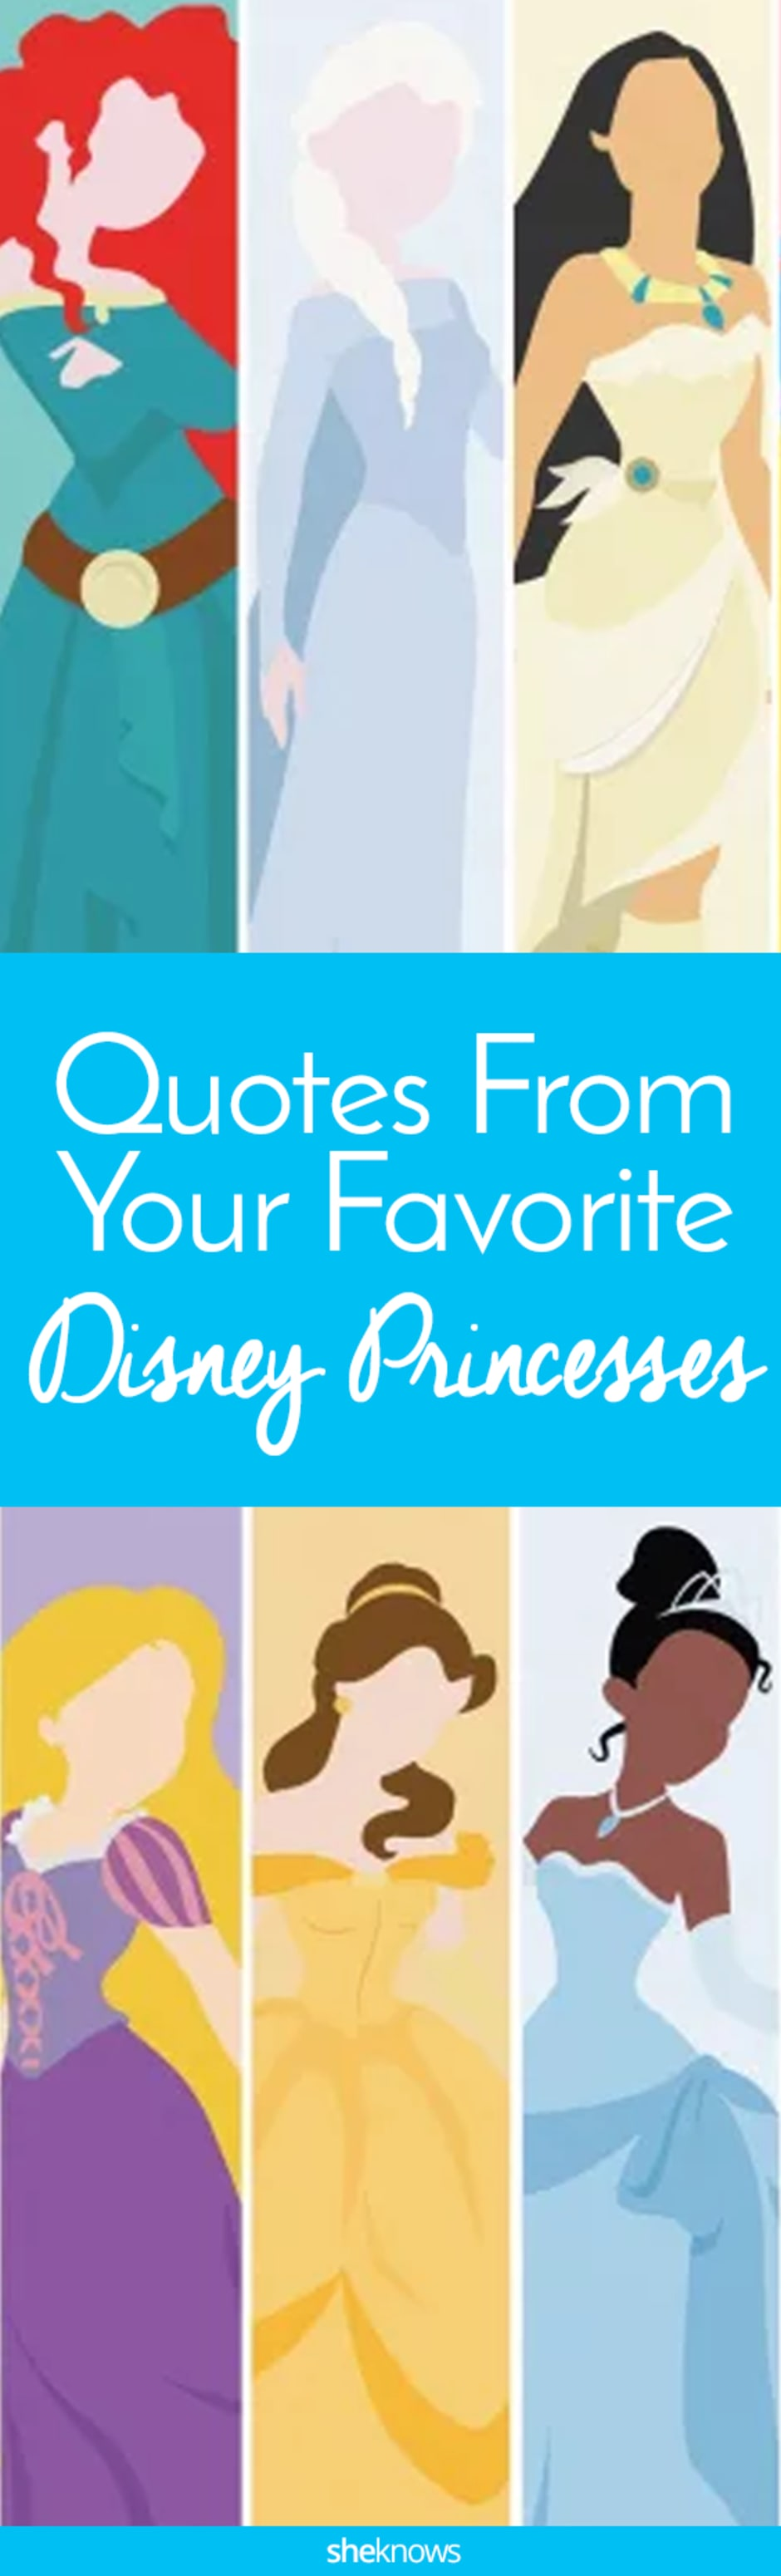 68-PIN-Princess_Quotes.png